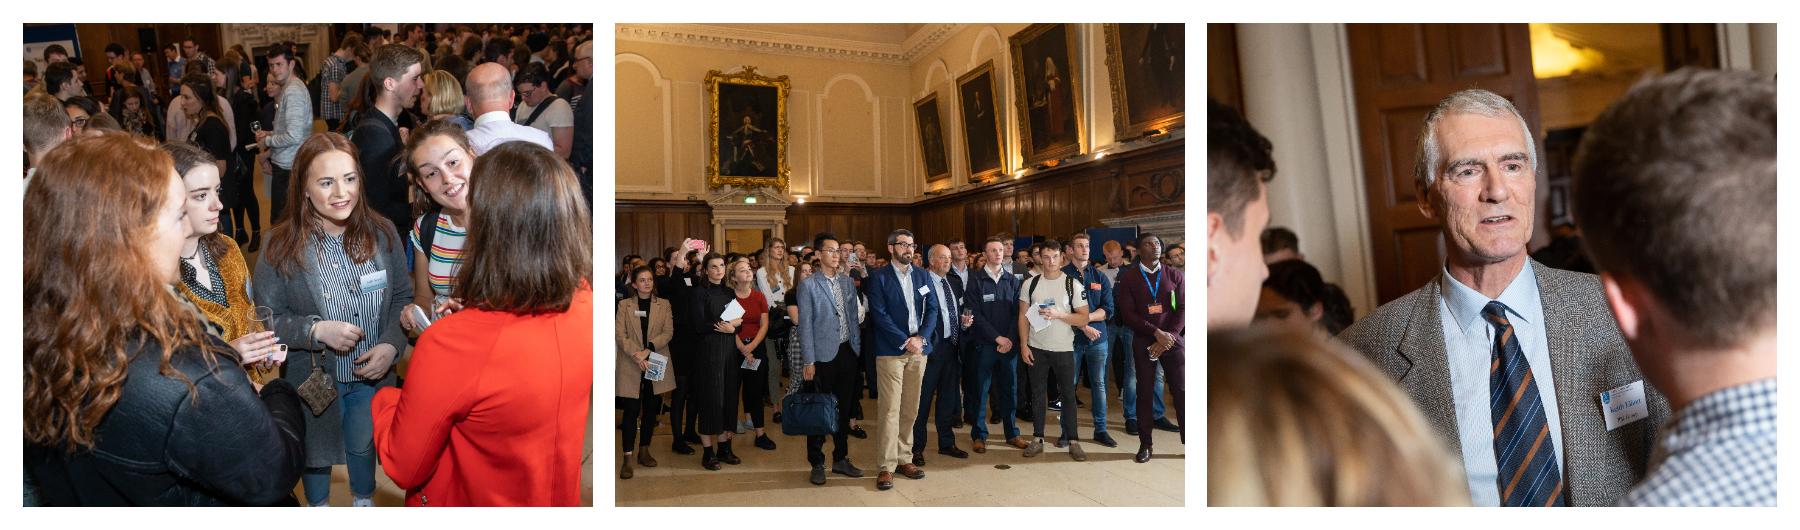 Mentoring Launch 2019: Technology, Engineering & Science (Alumni Registration)